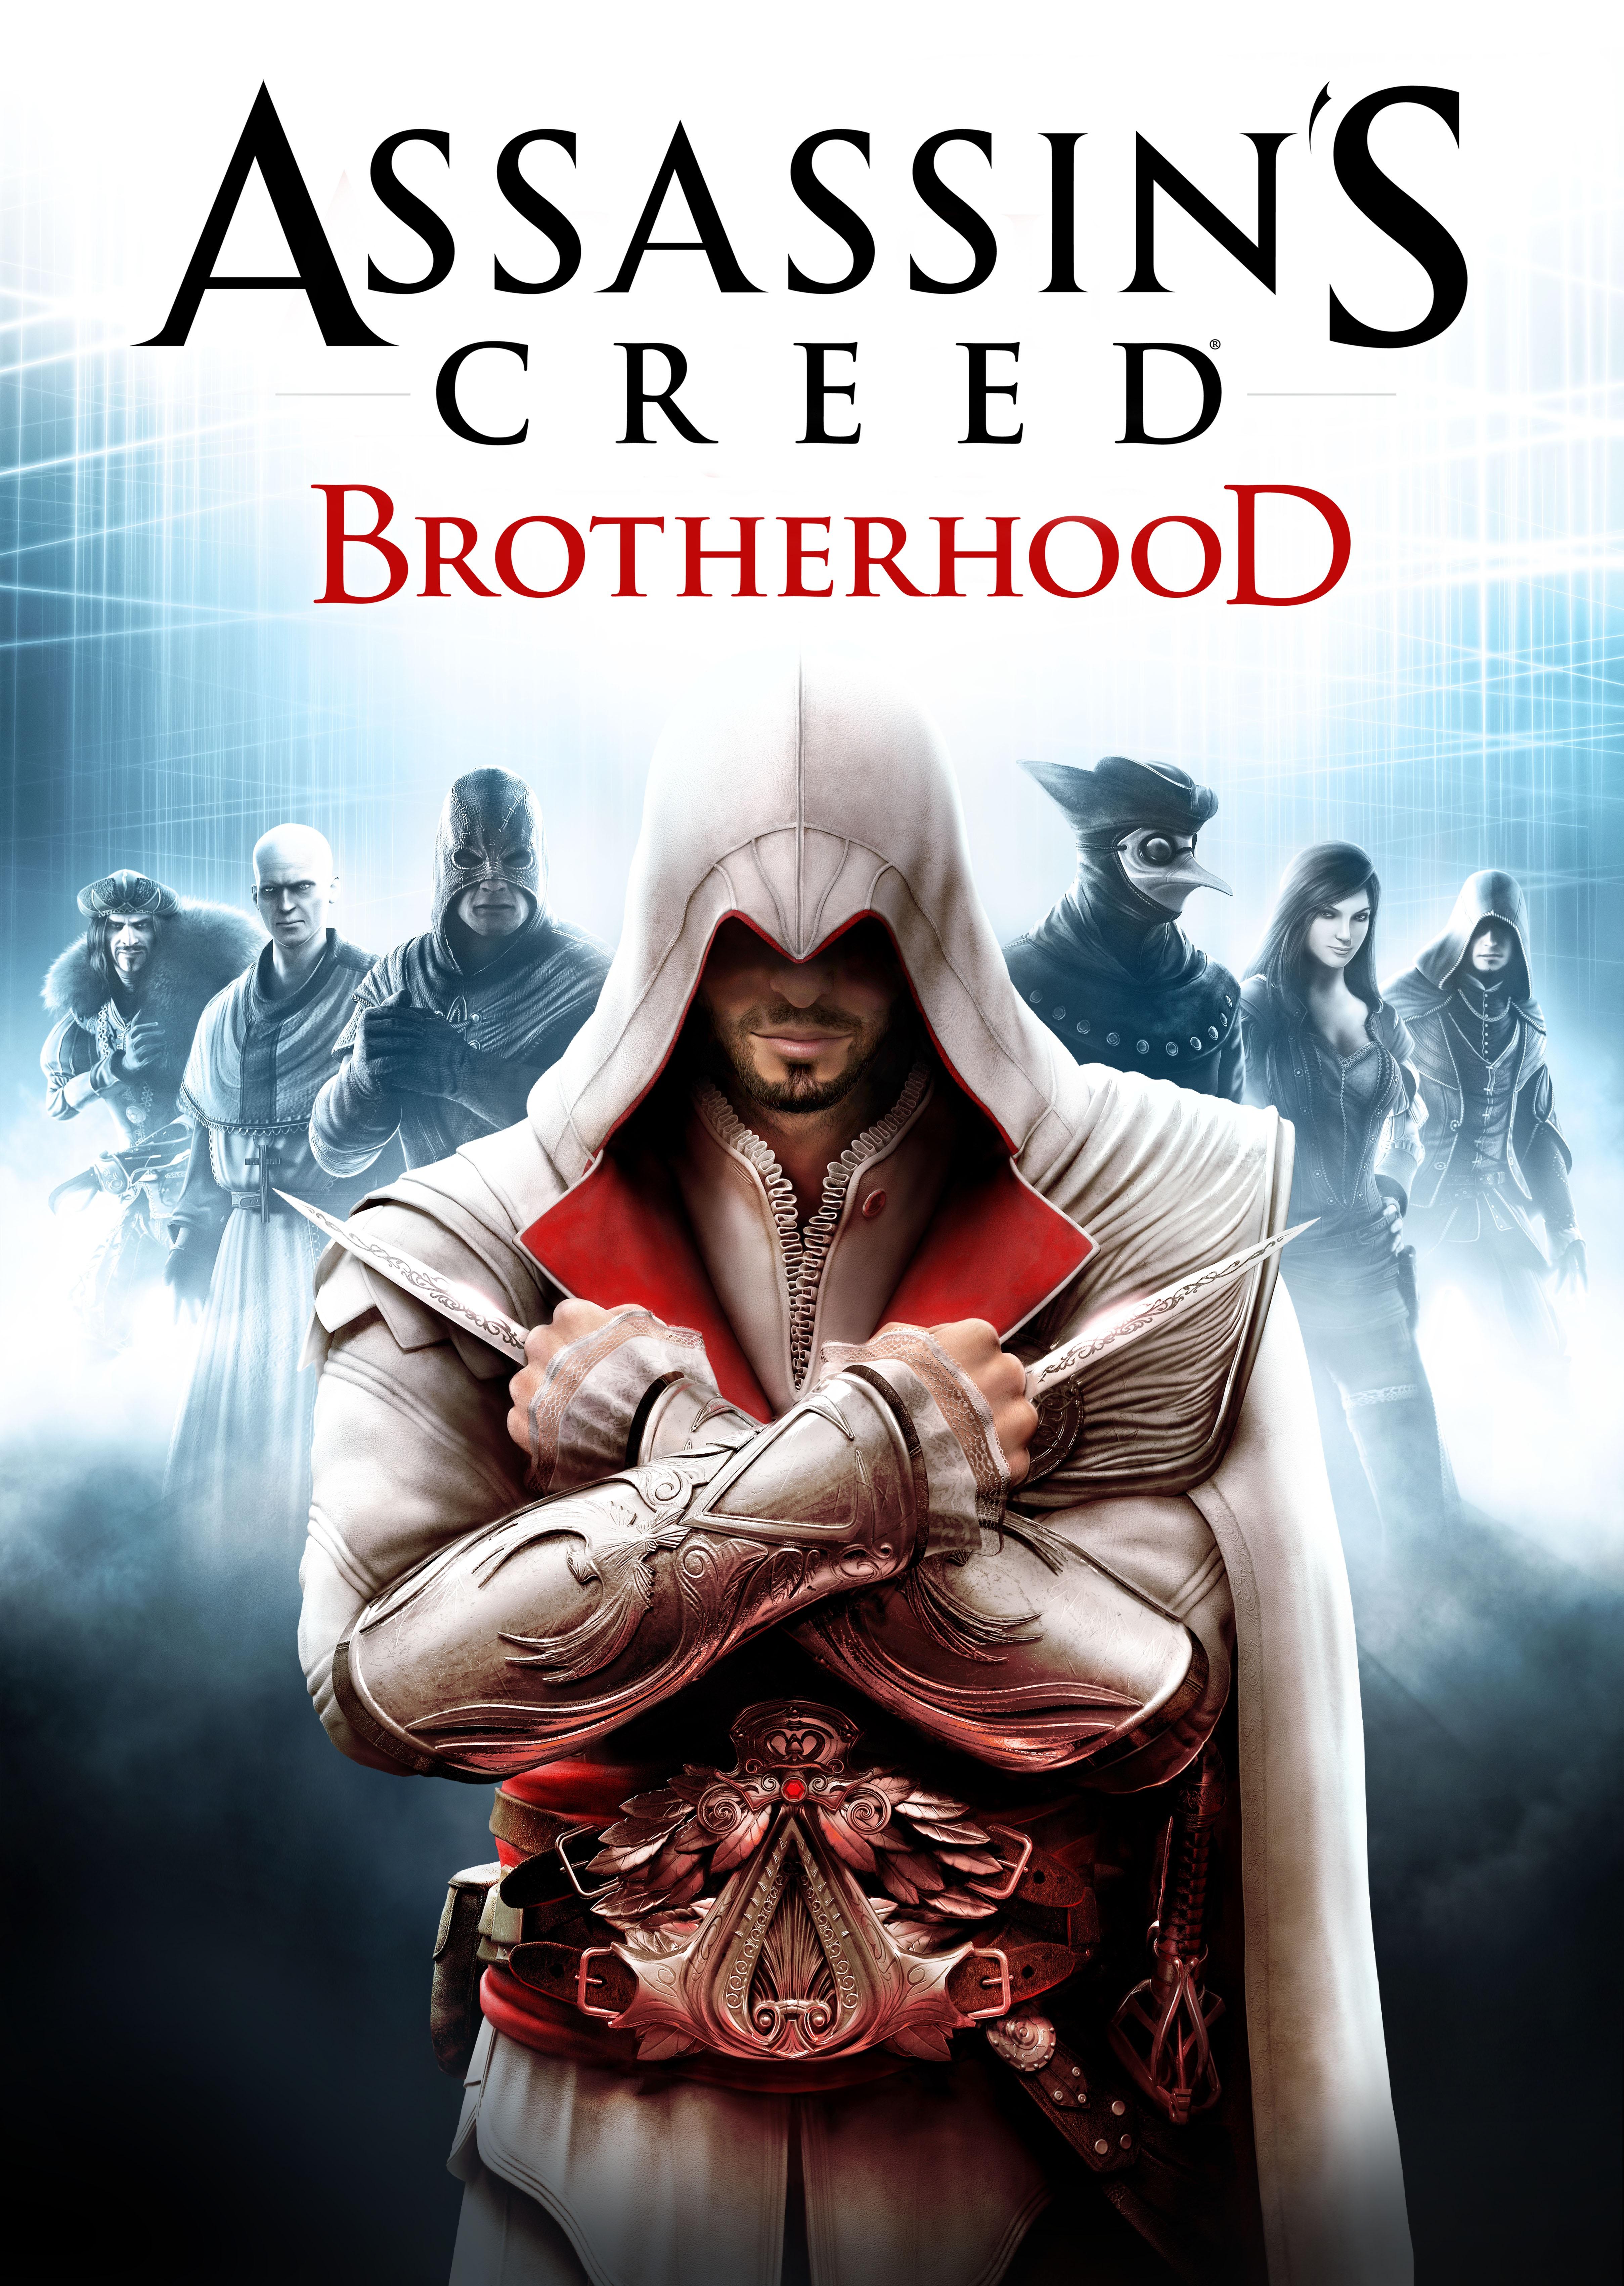 File:Assassins Creed brotherhood cover.jpg